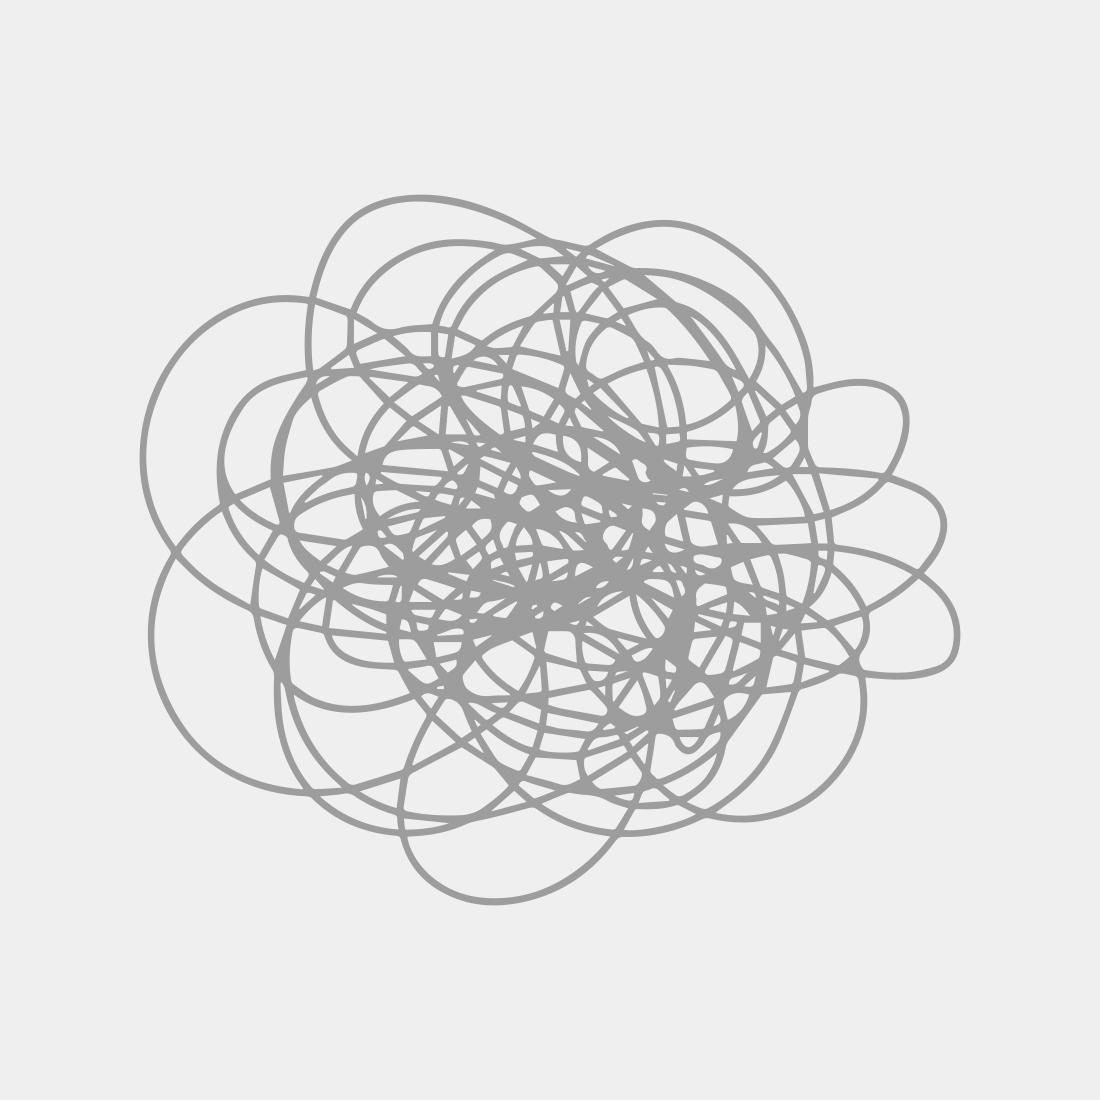 Albert Irvin OBE RA Untitled opus w.47